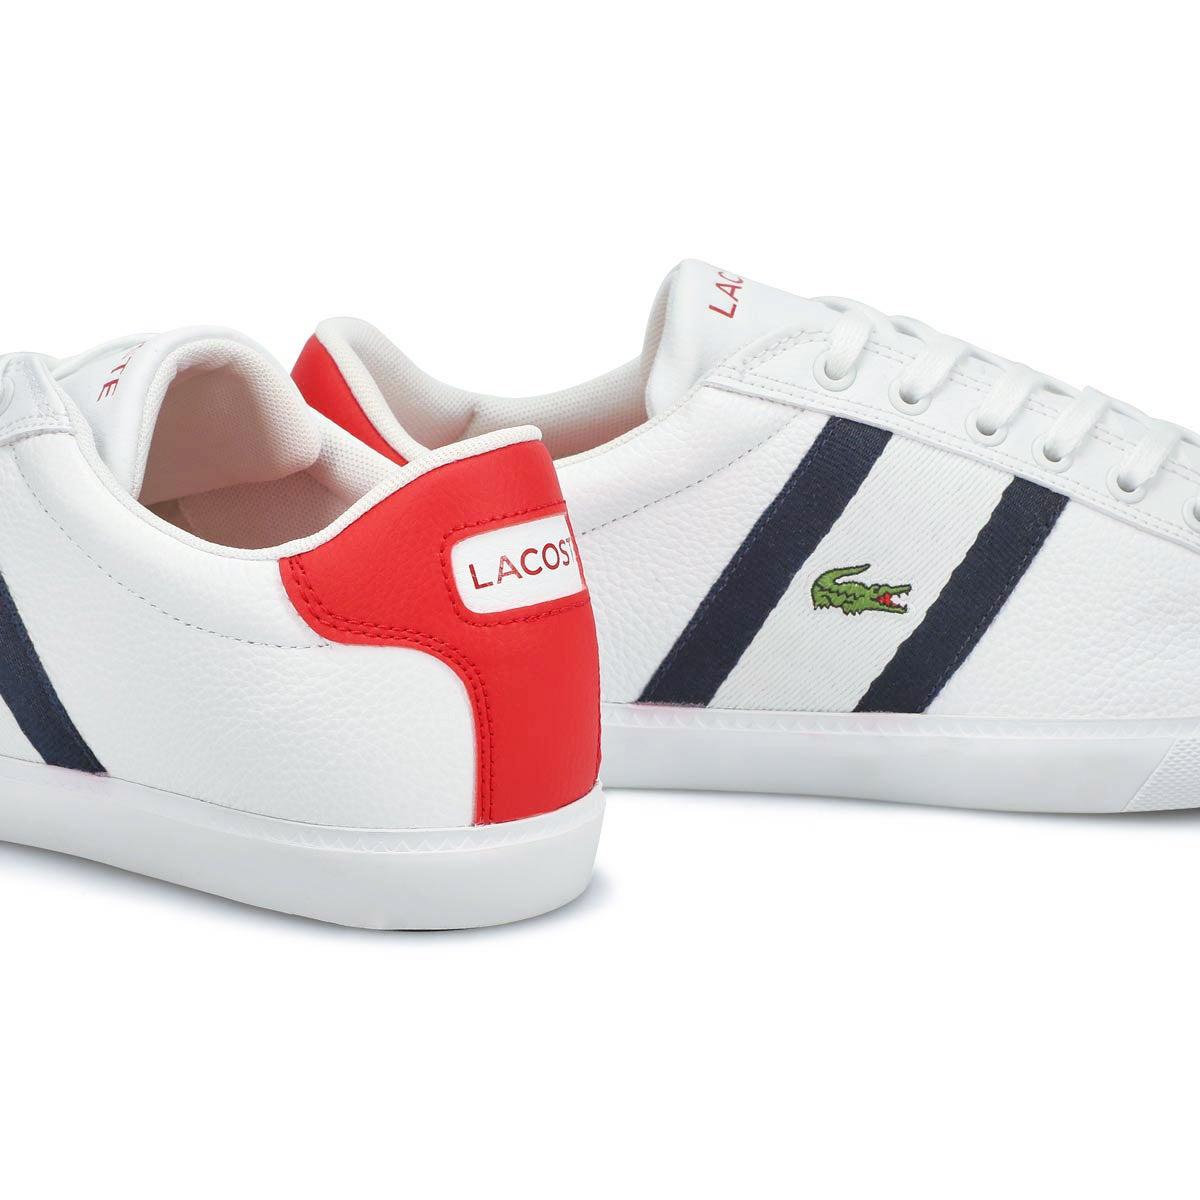 Mns Grad Vulc 120 2 wht/nvy sneaker